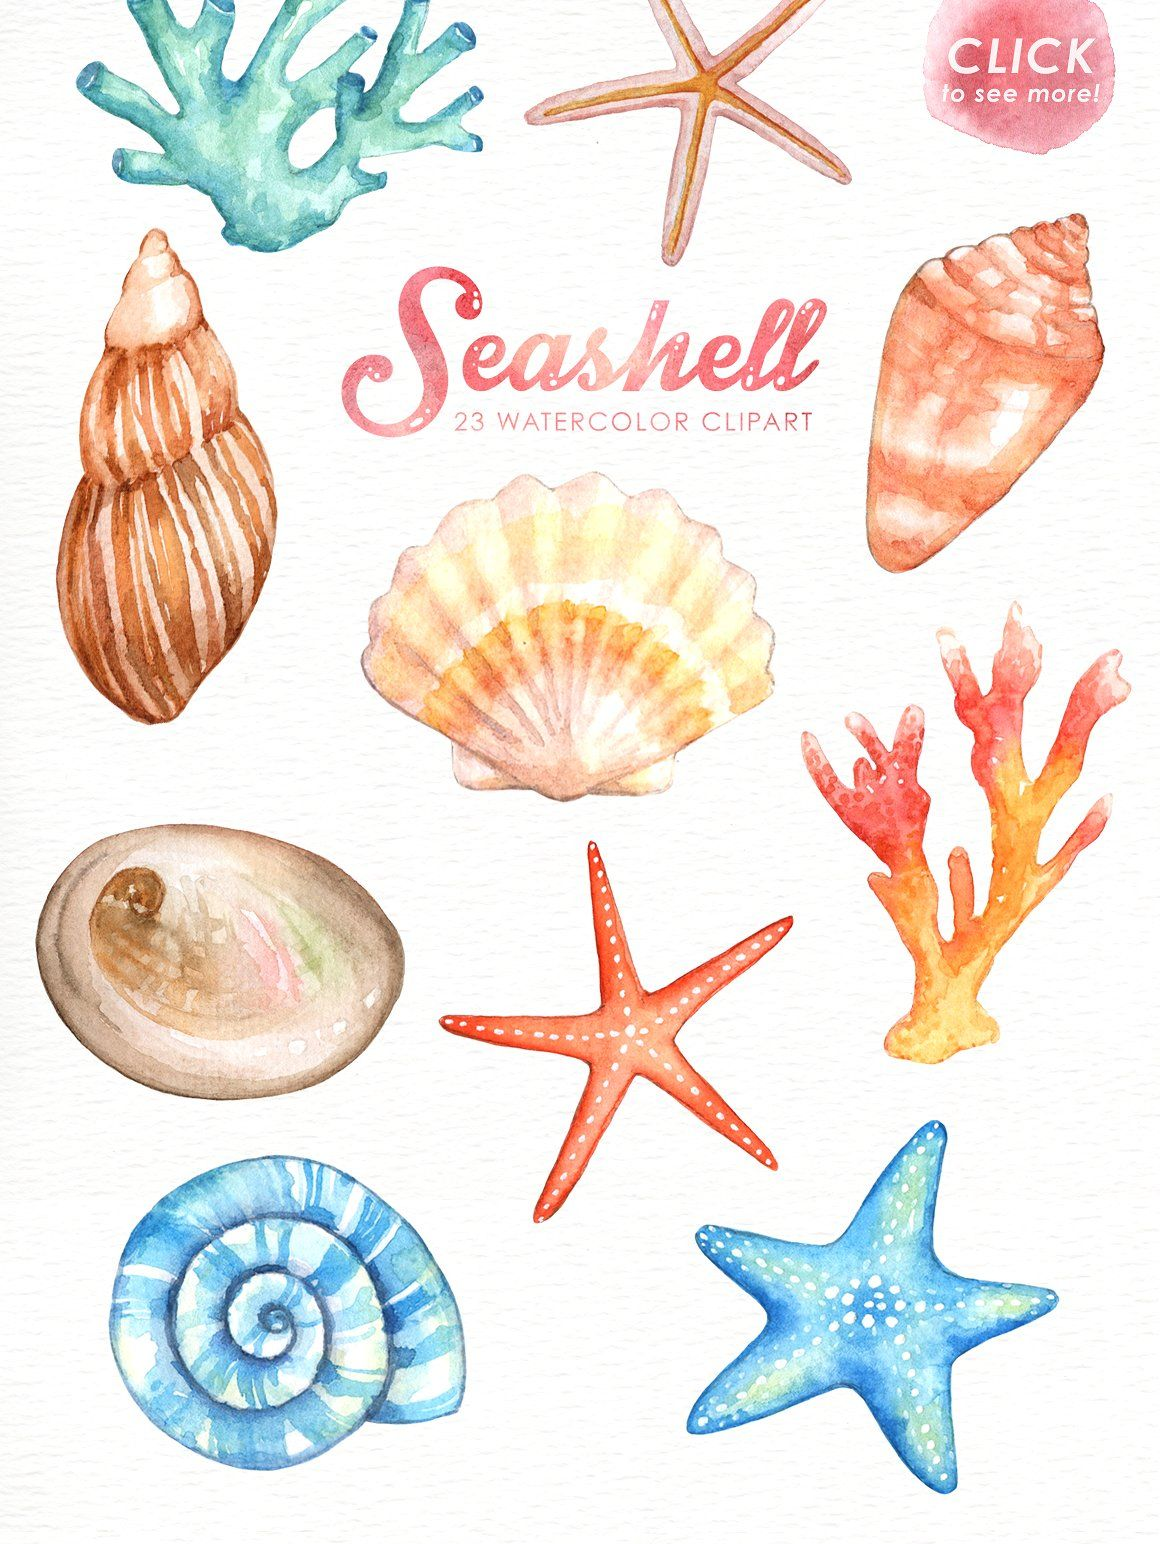 Seashell Watercolor Cliparts Nautical Watercolor Watercolor